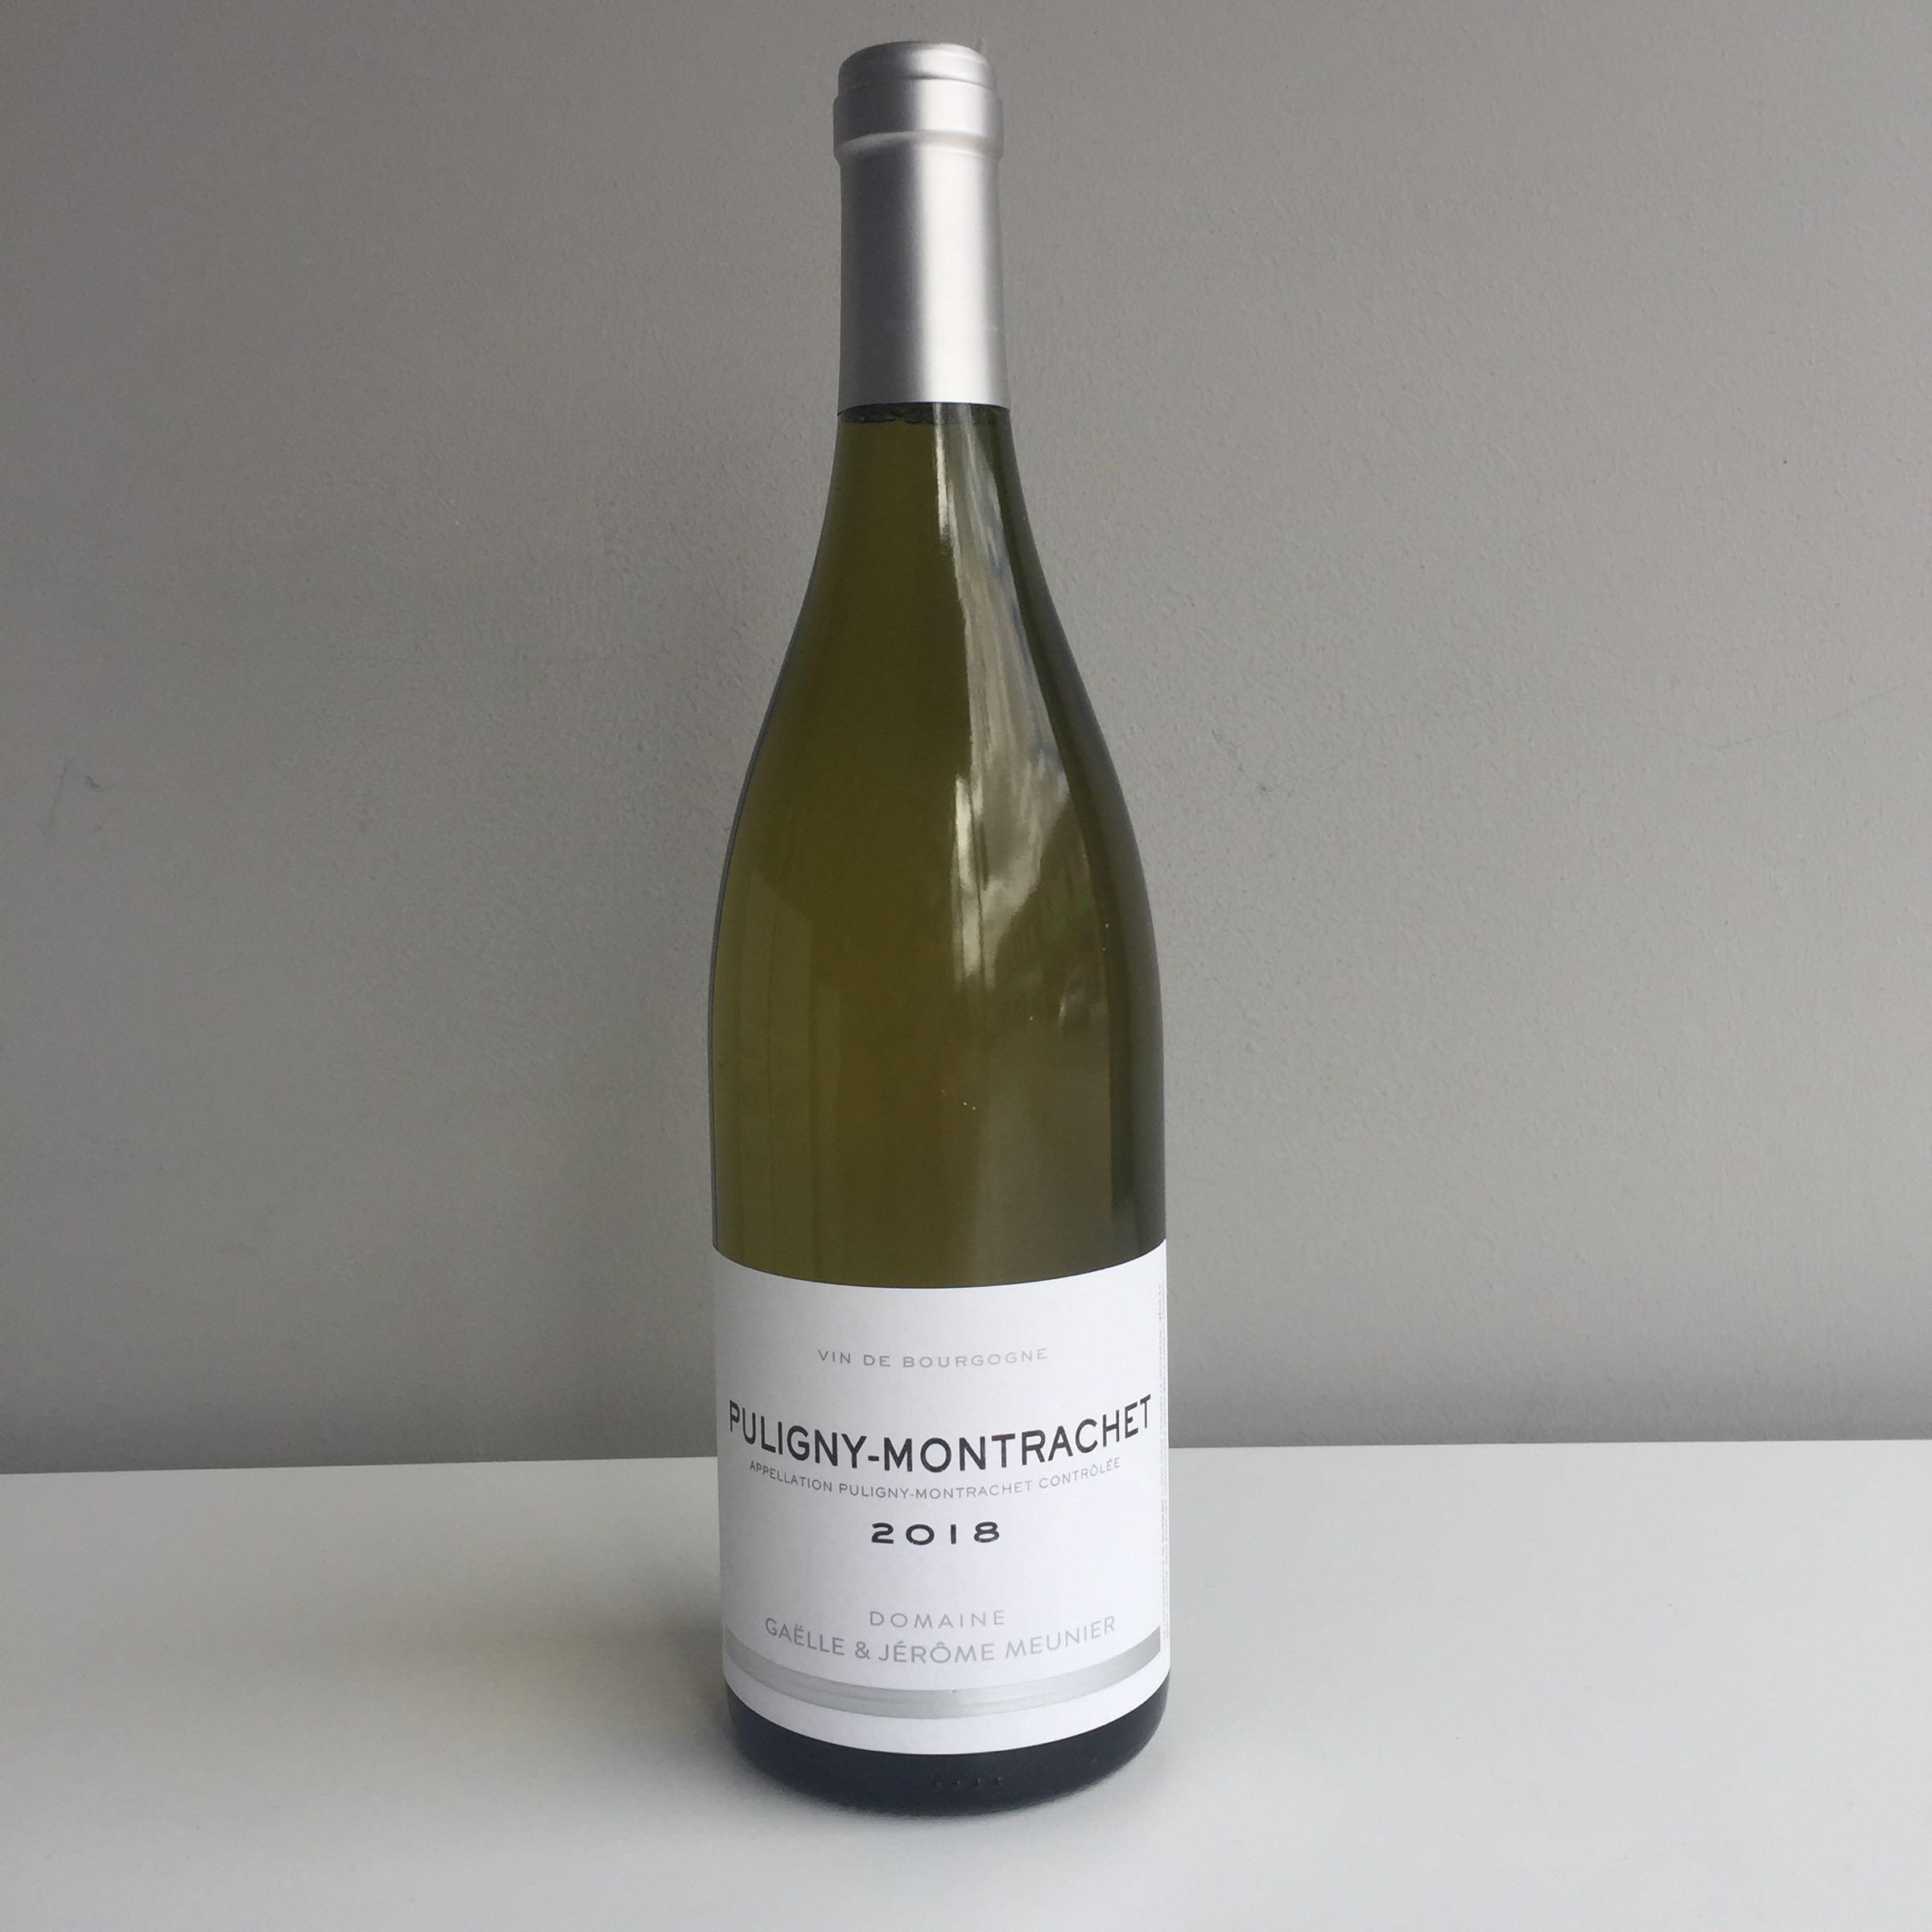 Puligny Montrachet 2018 - Domaine Gaëlle & Jerome Meunier